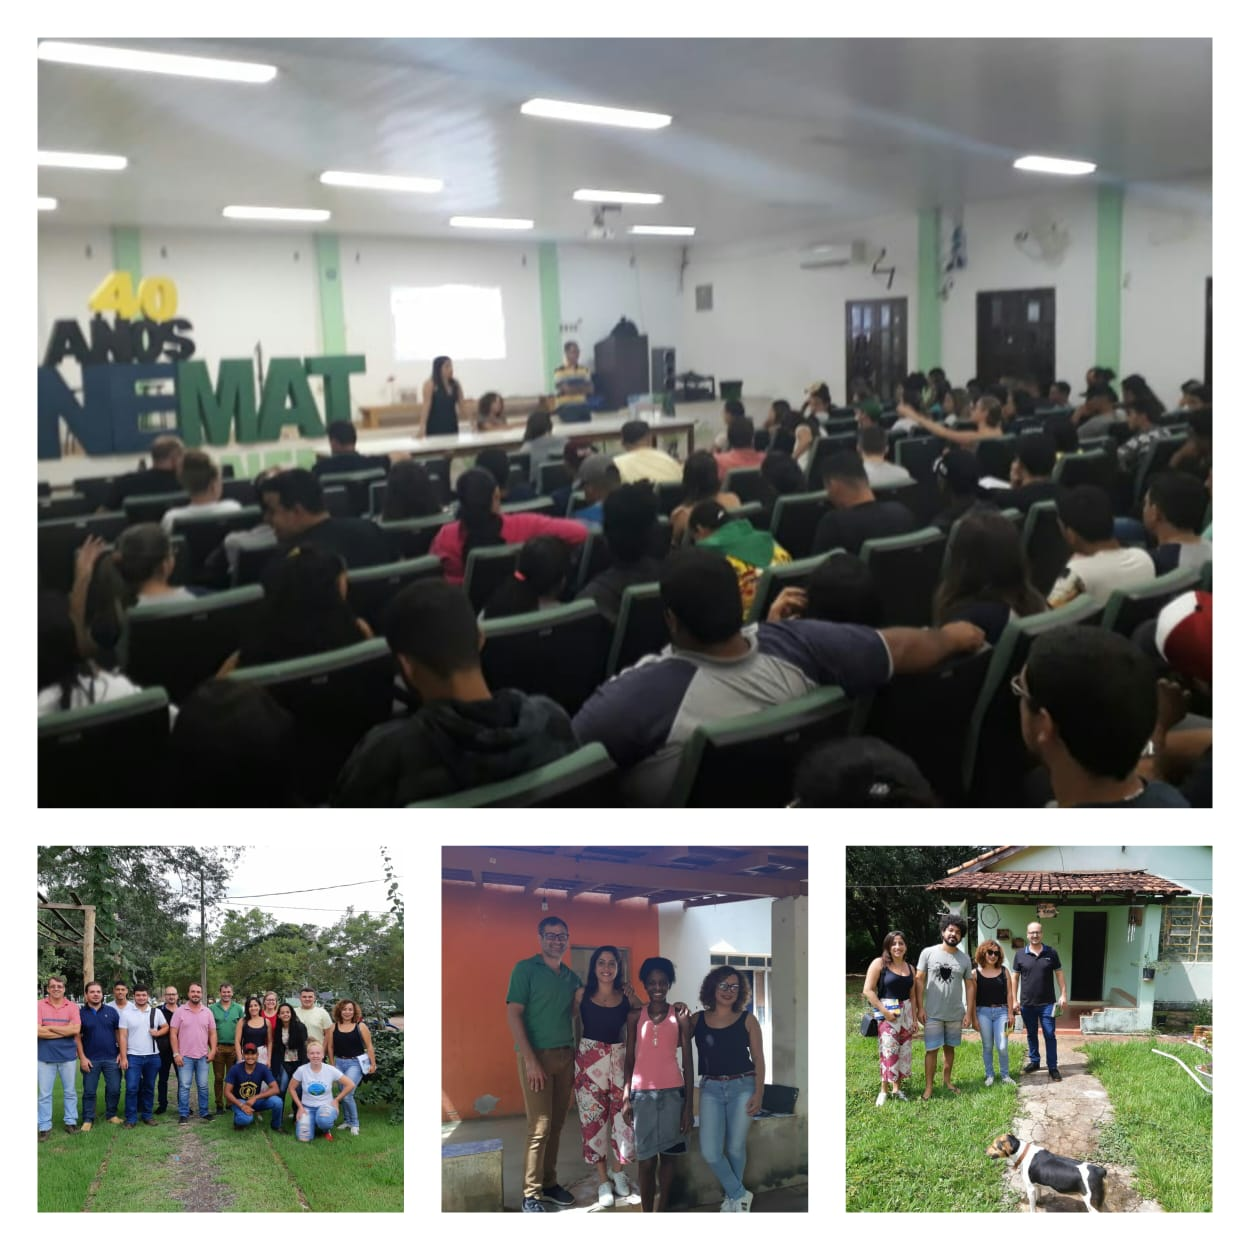 UNEMAT - Câmpus Universitário de Nova Xavantina: Equipe da